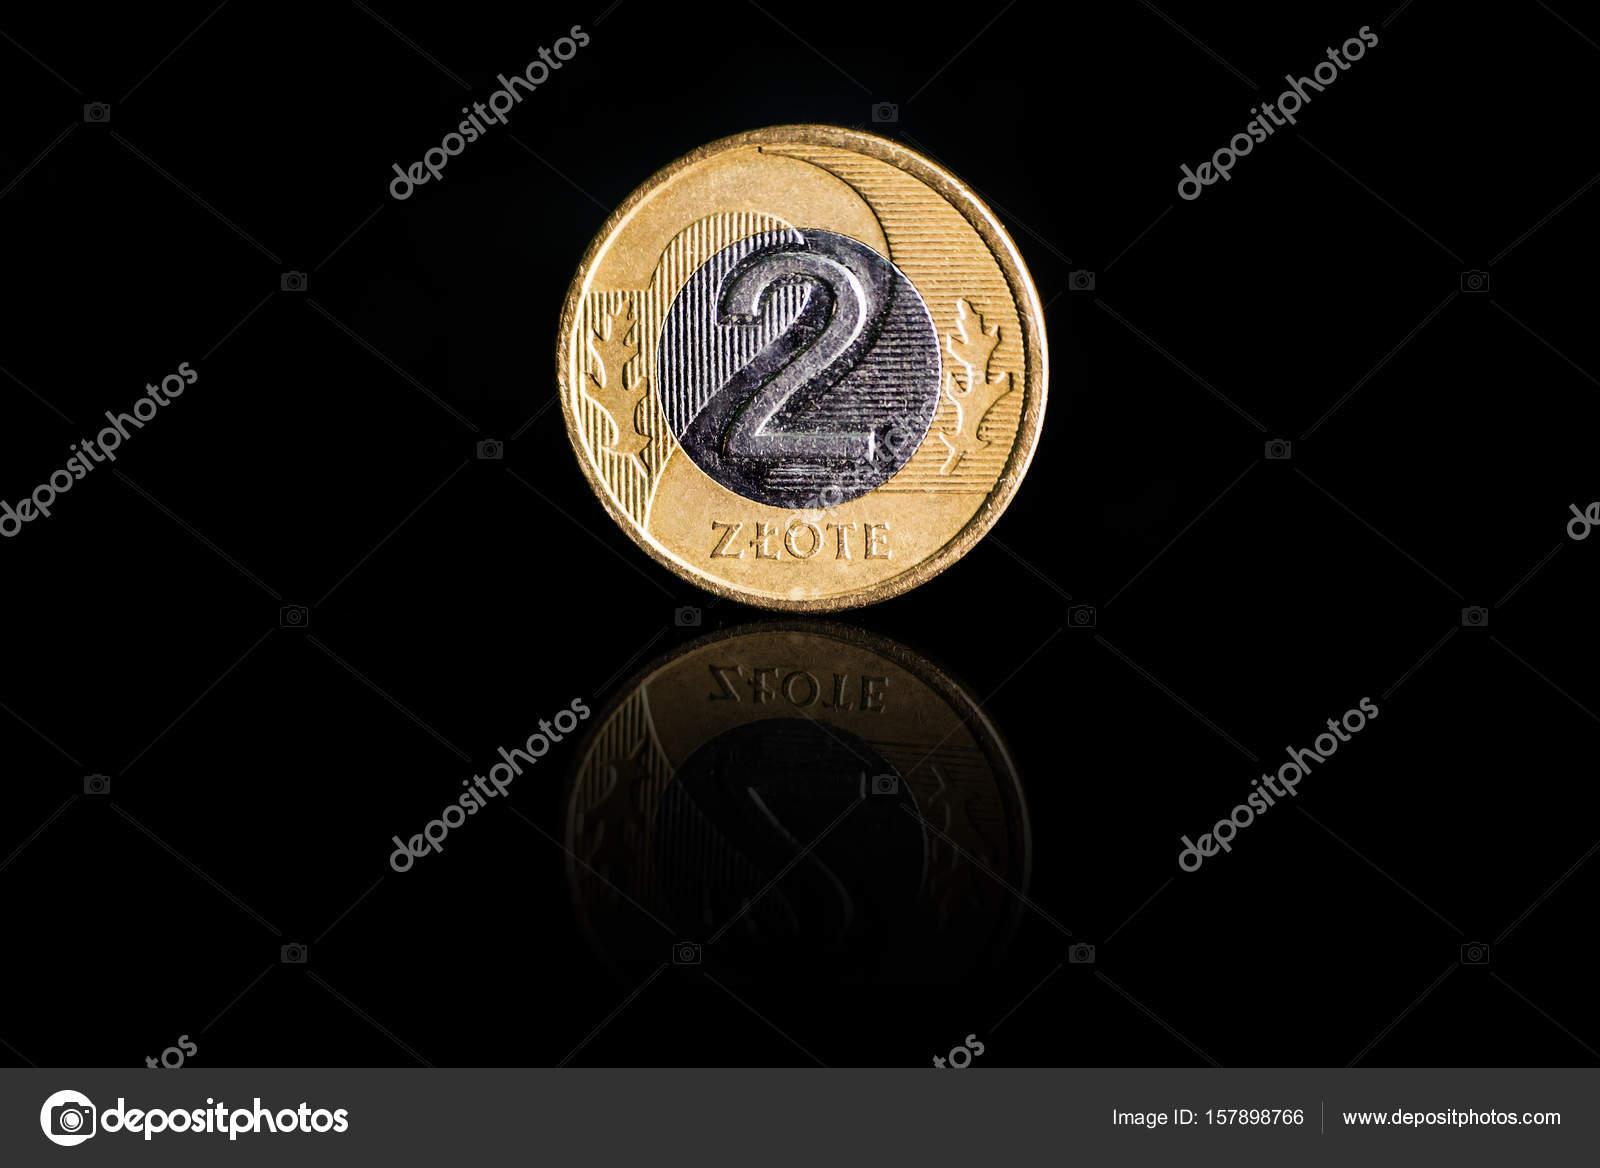 Münze Polen 2 Zloty Stockfoto Diy13 At Yaru 157898766